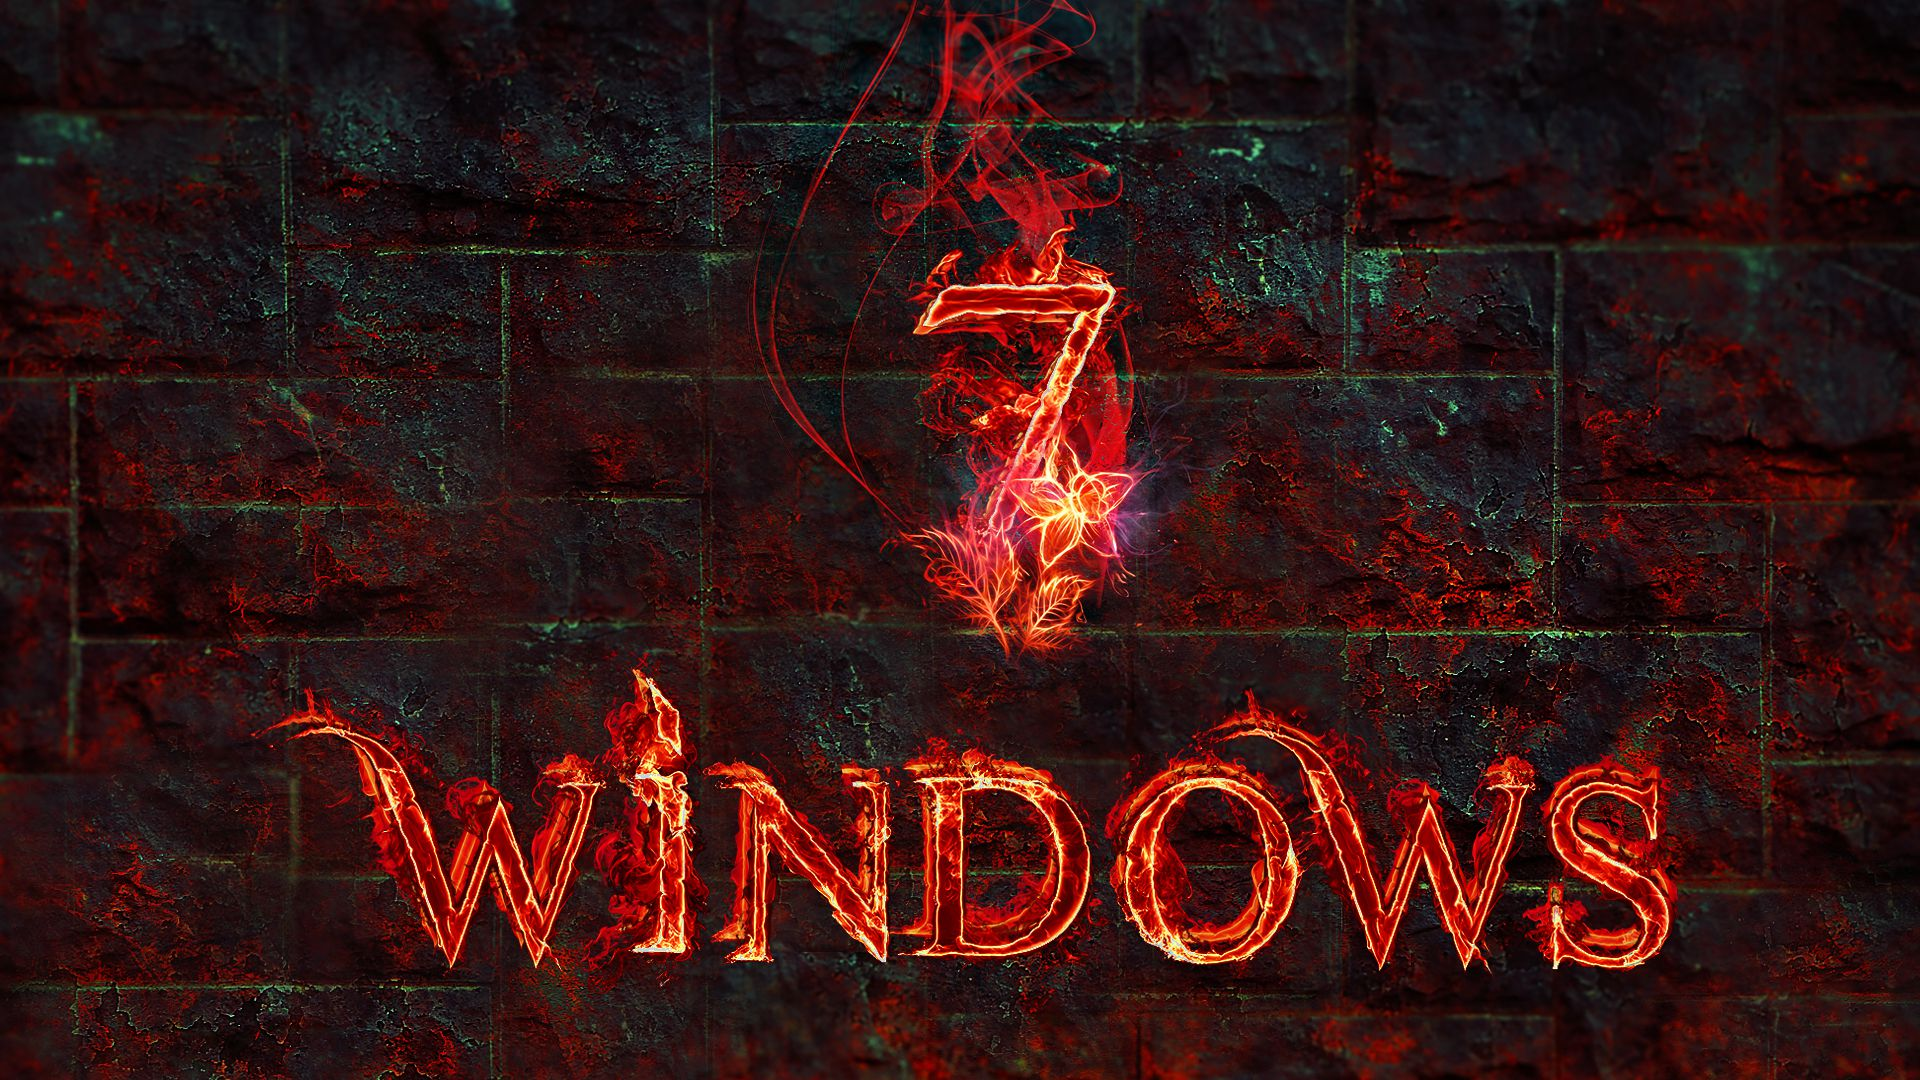 Windows 7 Fond Décran Hd Arrière Plan 1920x1080 Id587914